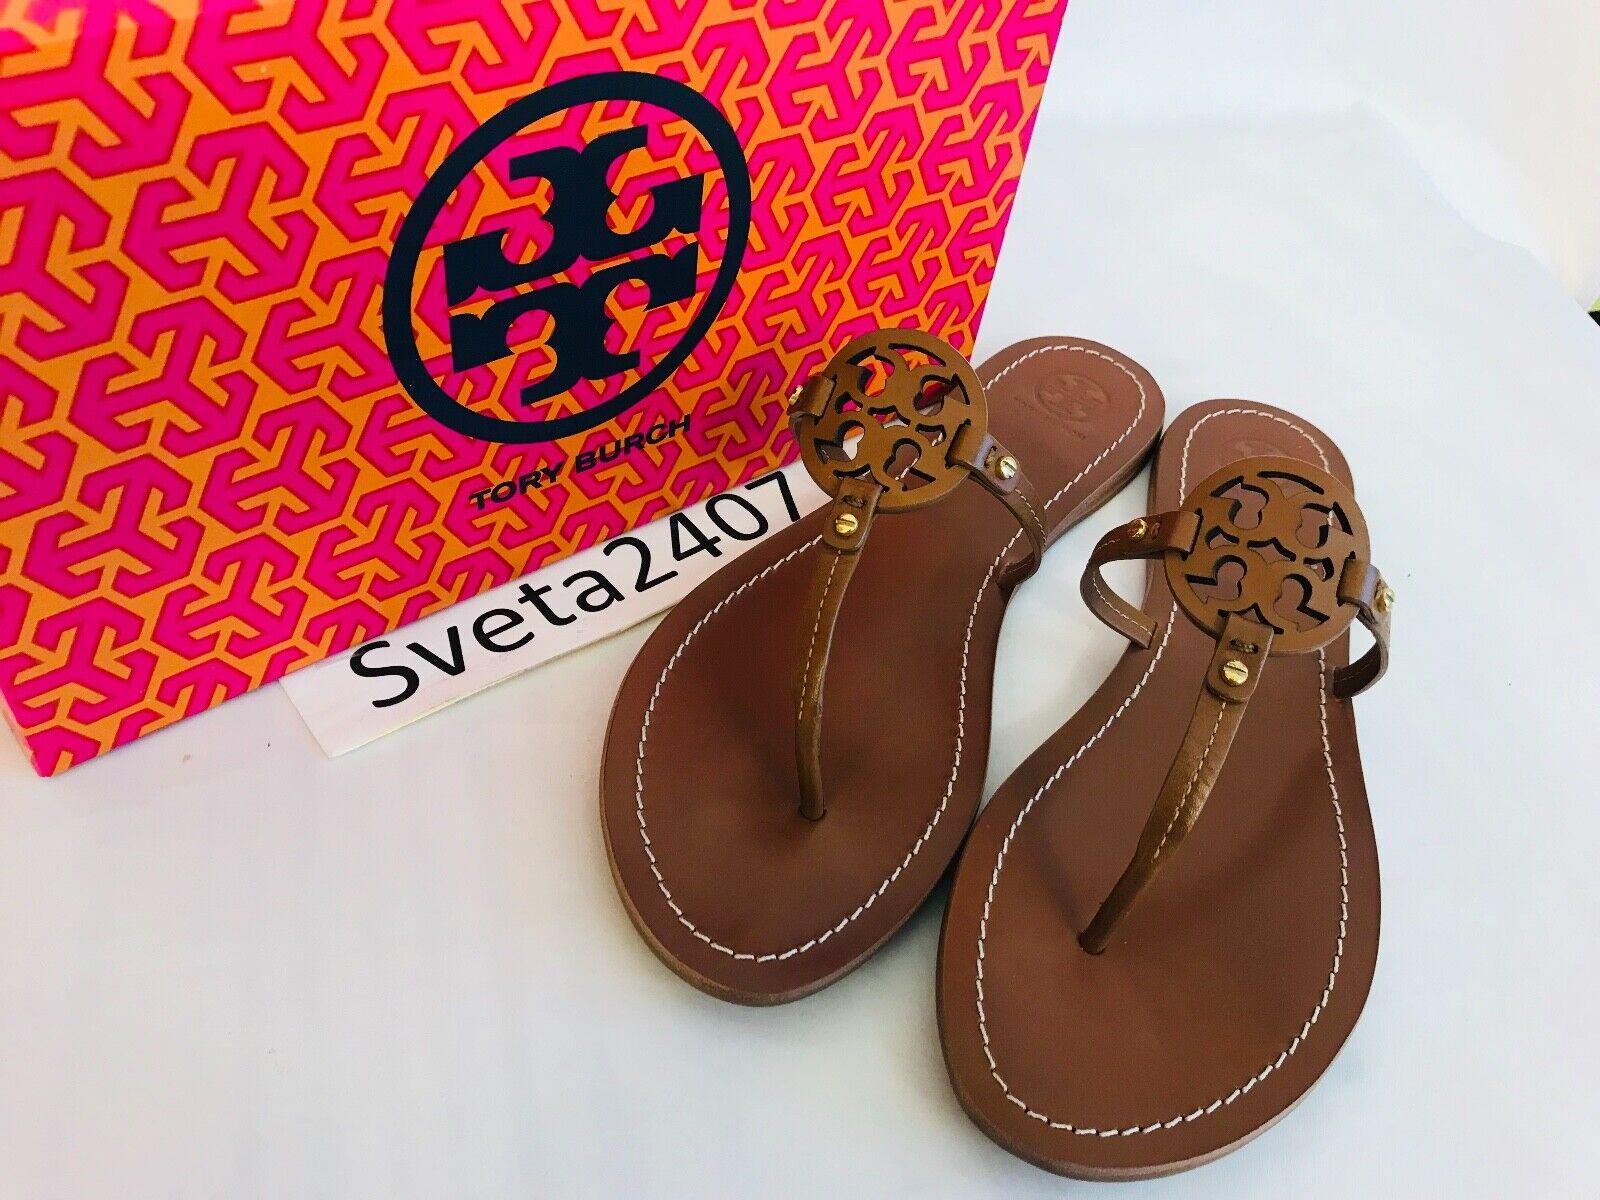 Tory Burch NIB MINI MILLER Thong  Flat Sandals Leather Logo 35;32340 Royal Tan  negozio all'ingrosso